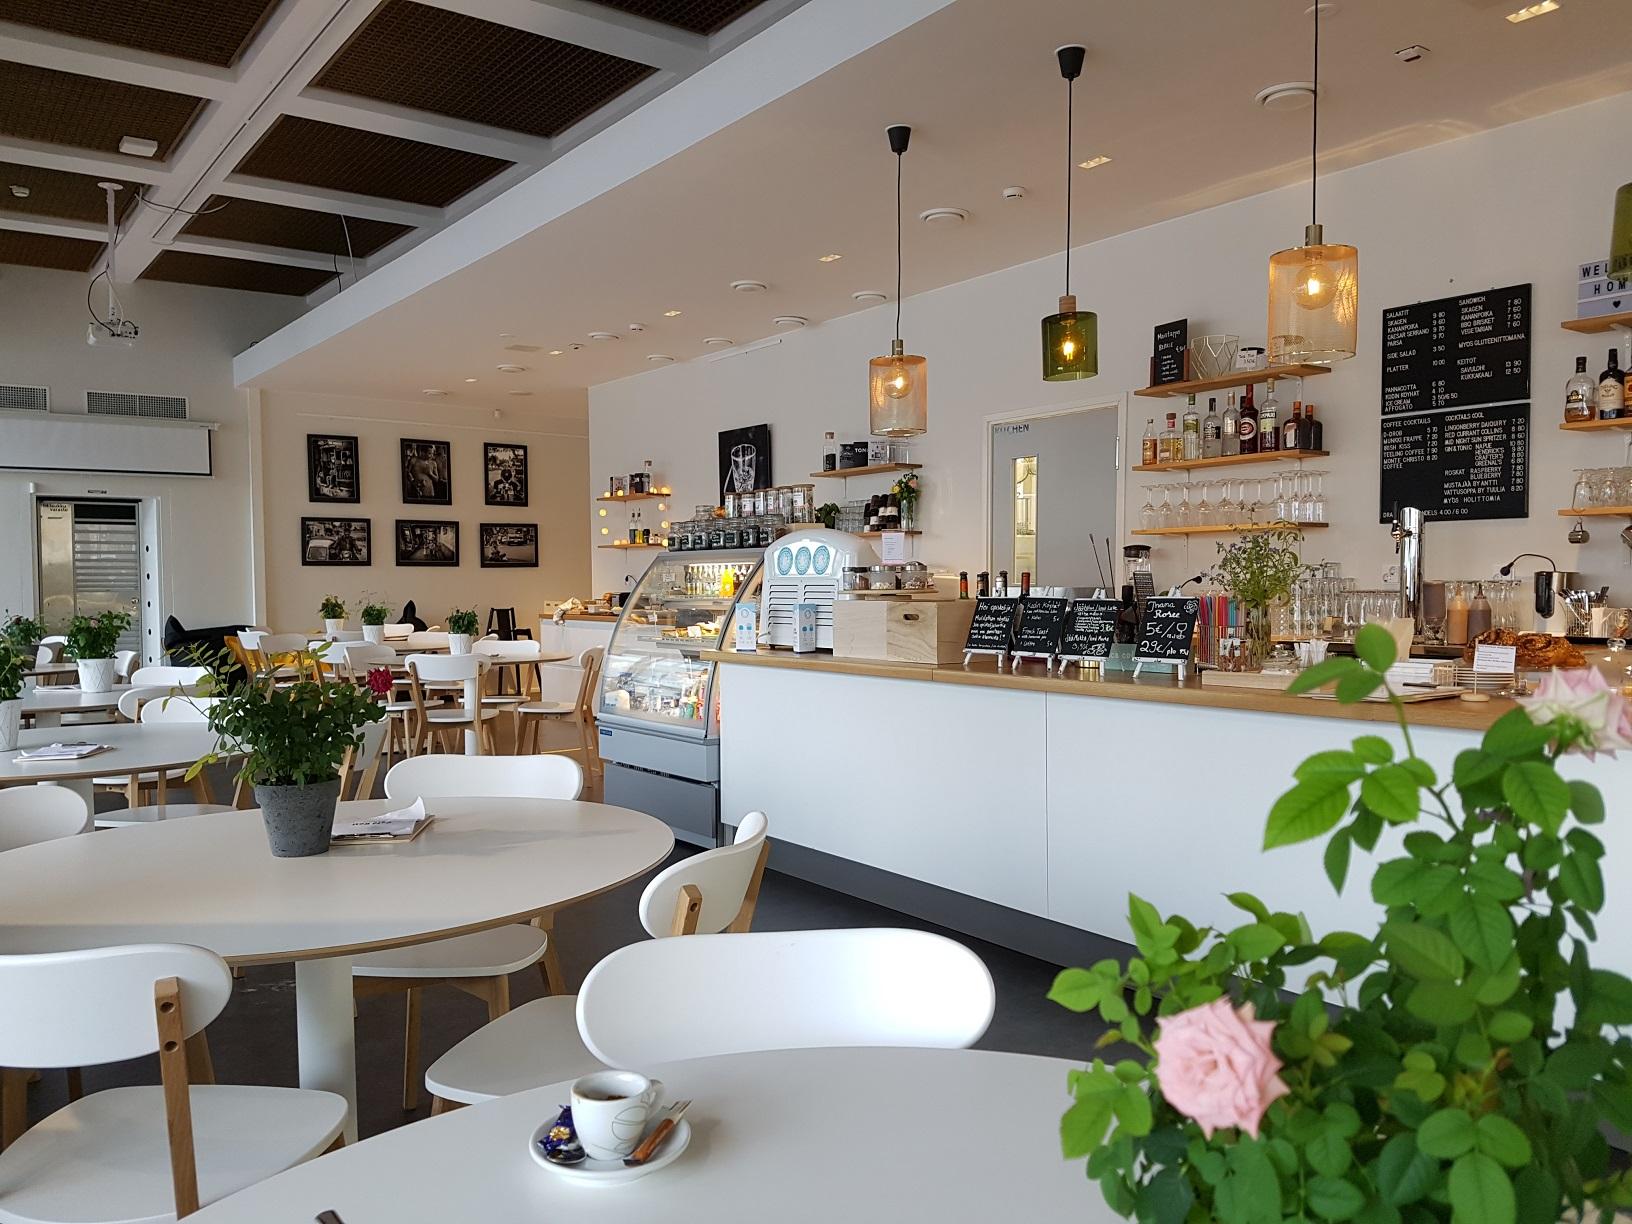 Hostel Cafe Koti Rovaniemi